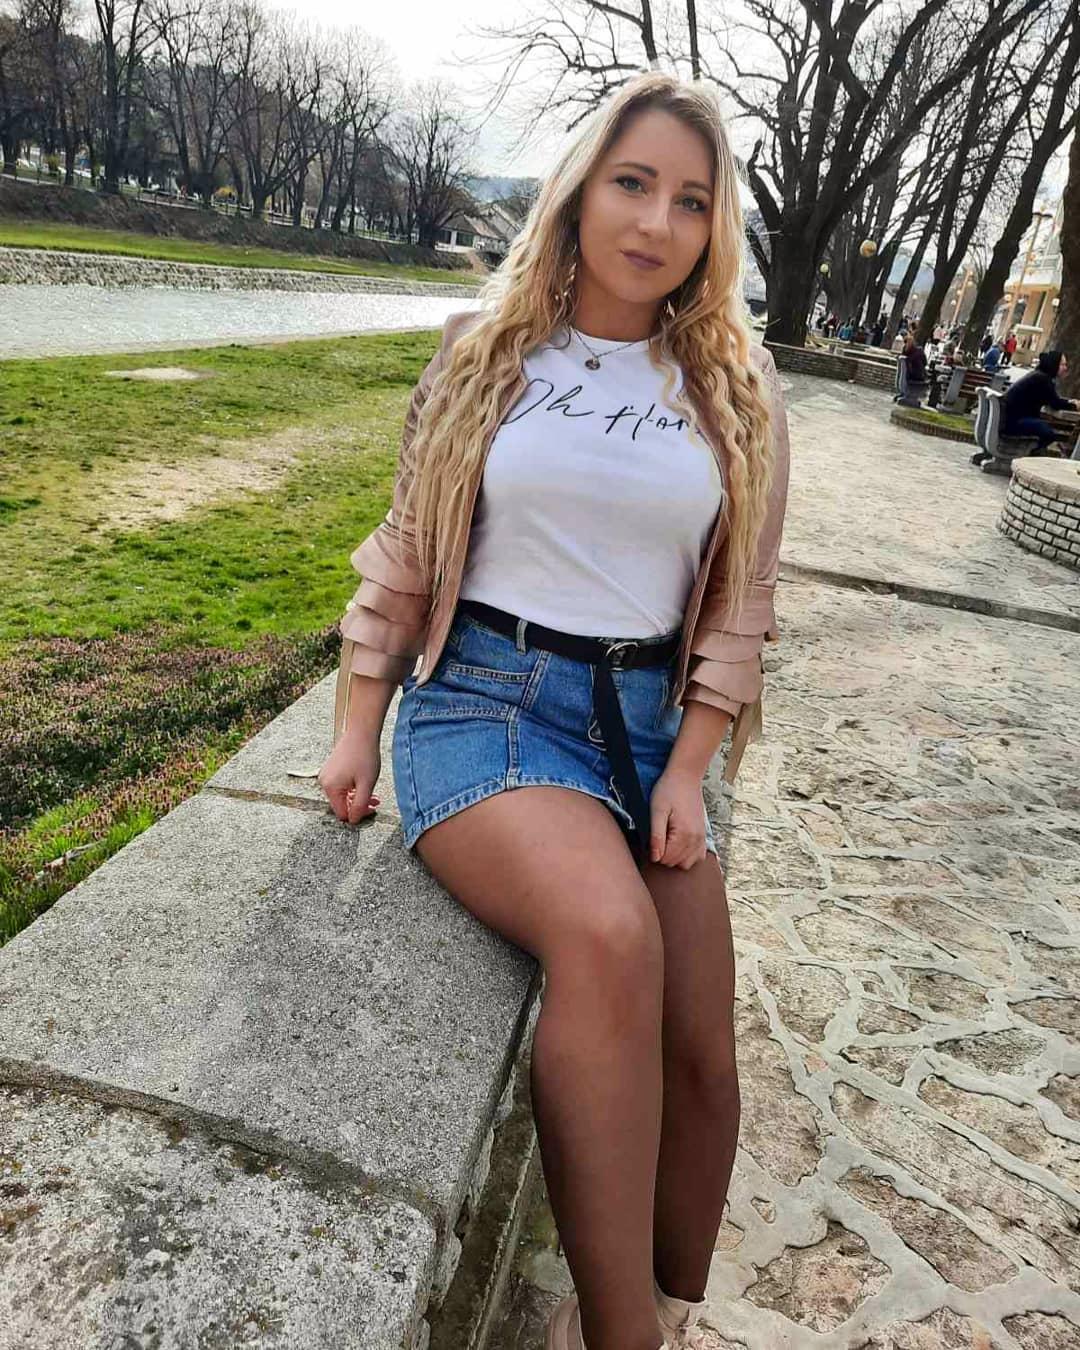 Kosana-Pavlovic-Wallpapers-Insta-Fit-Bio-15